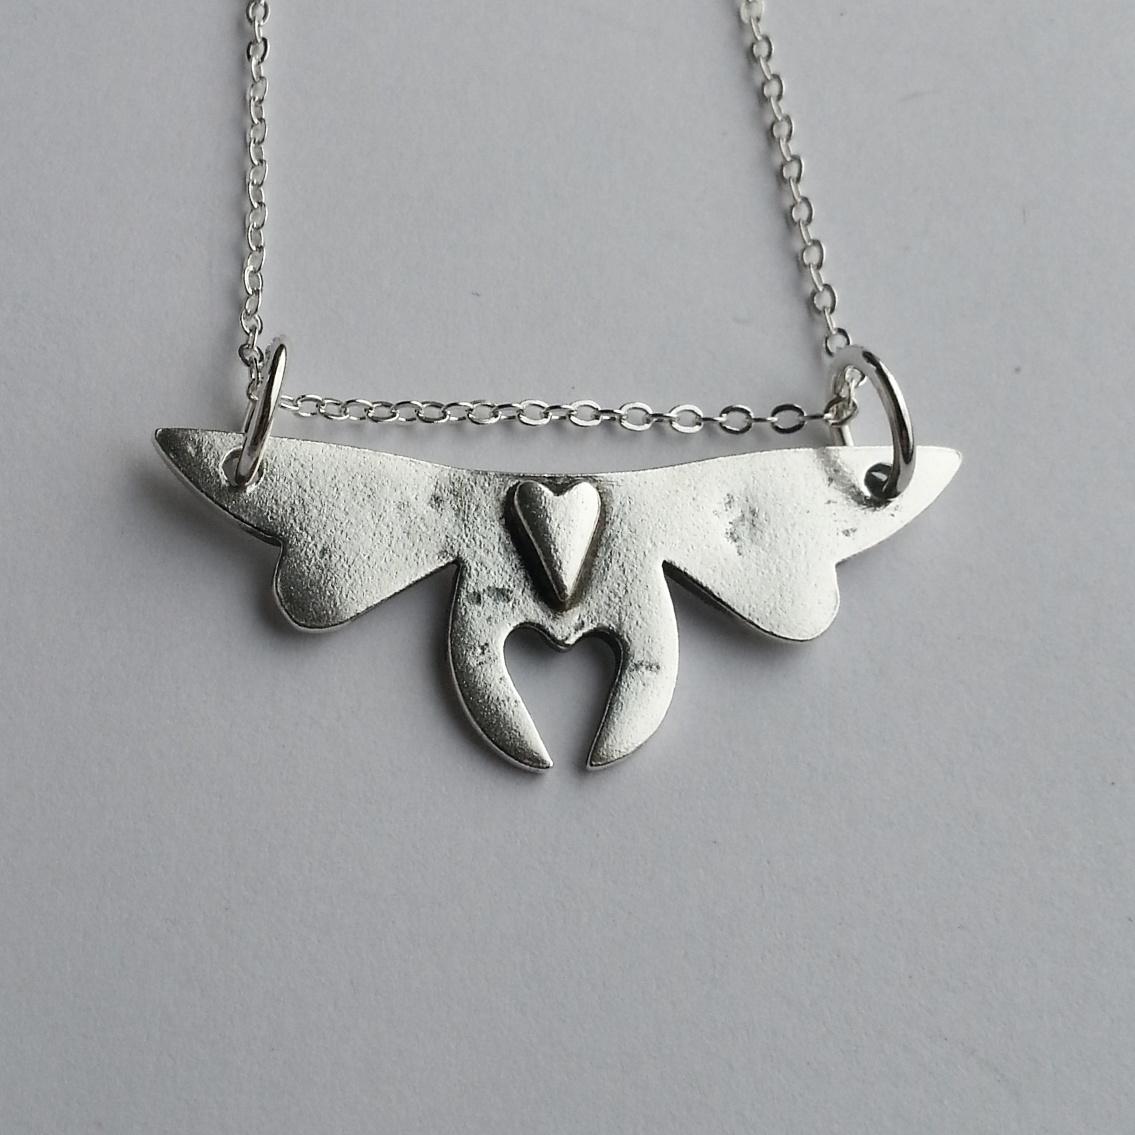 Unique Sterling Silver Love Bug Heart, Original Handcrafted Pendant